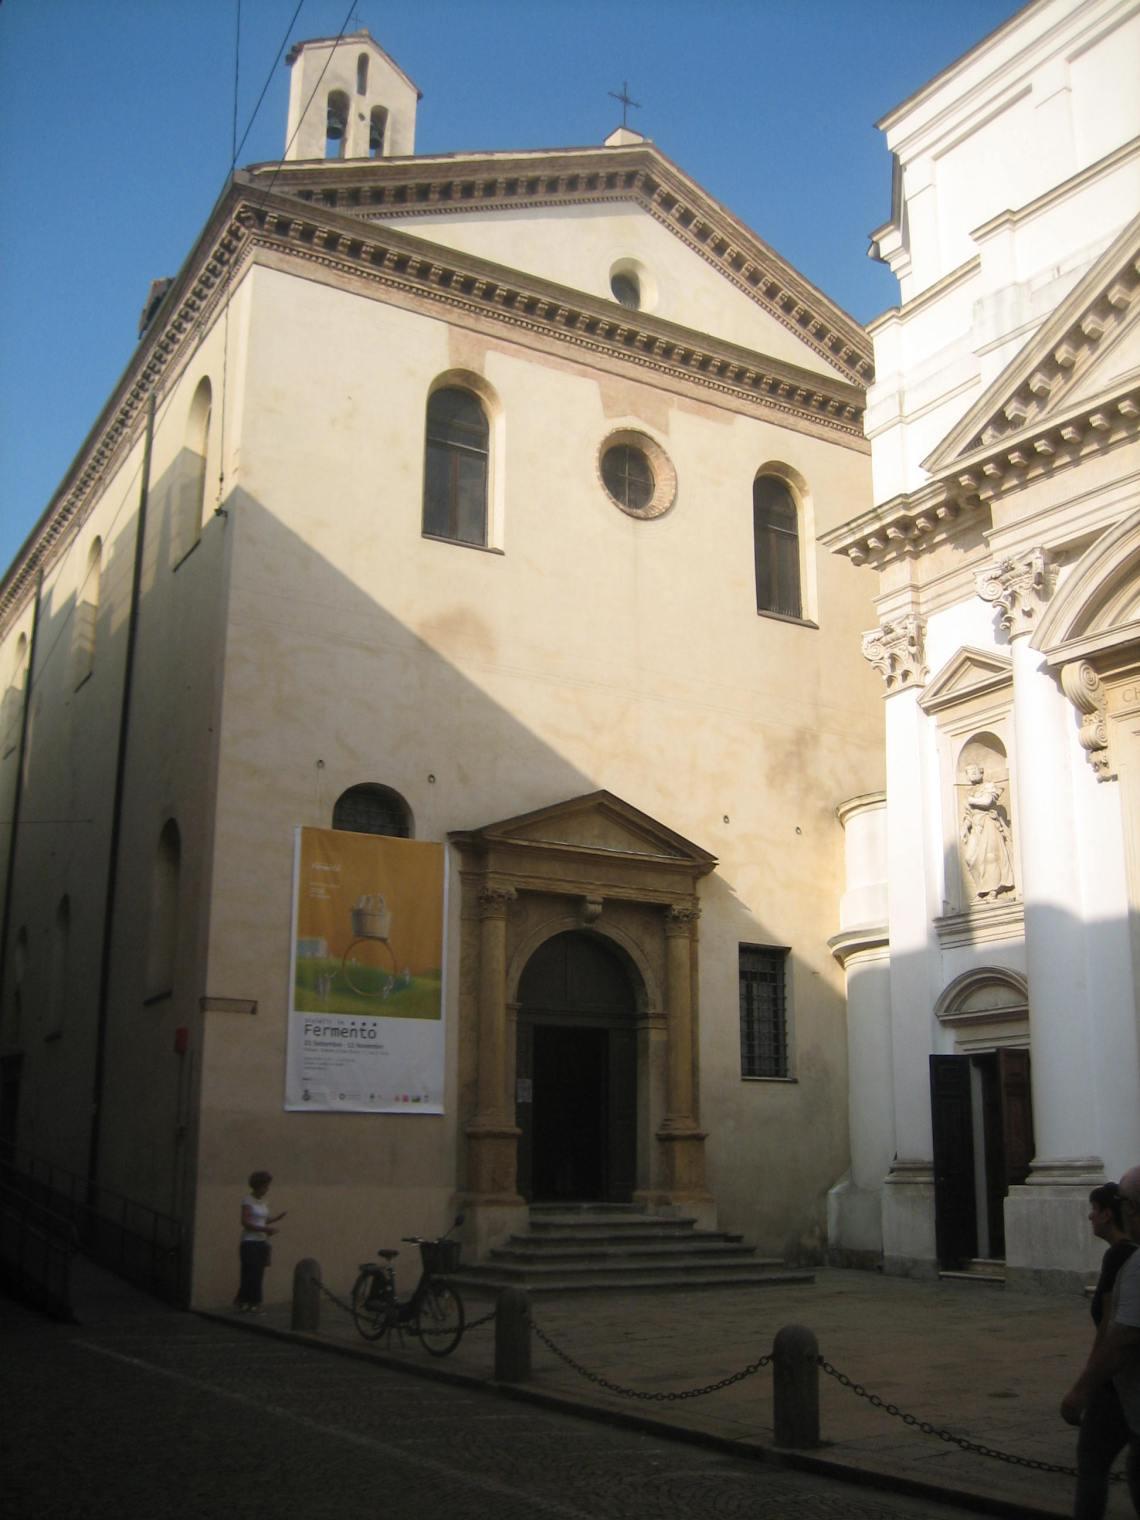 Oratorio di San Rocco, Padua. Foto Esther Doornbusch, september 2018, CC BY 4.0